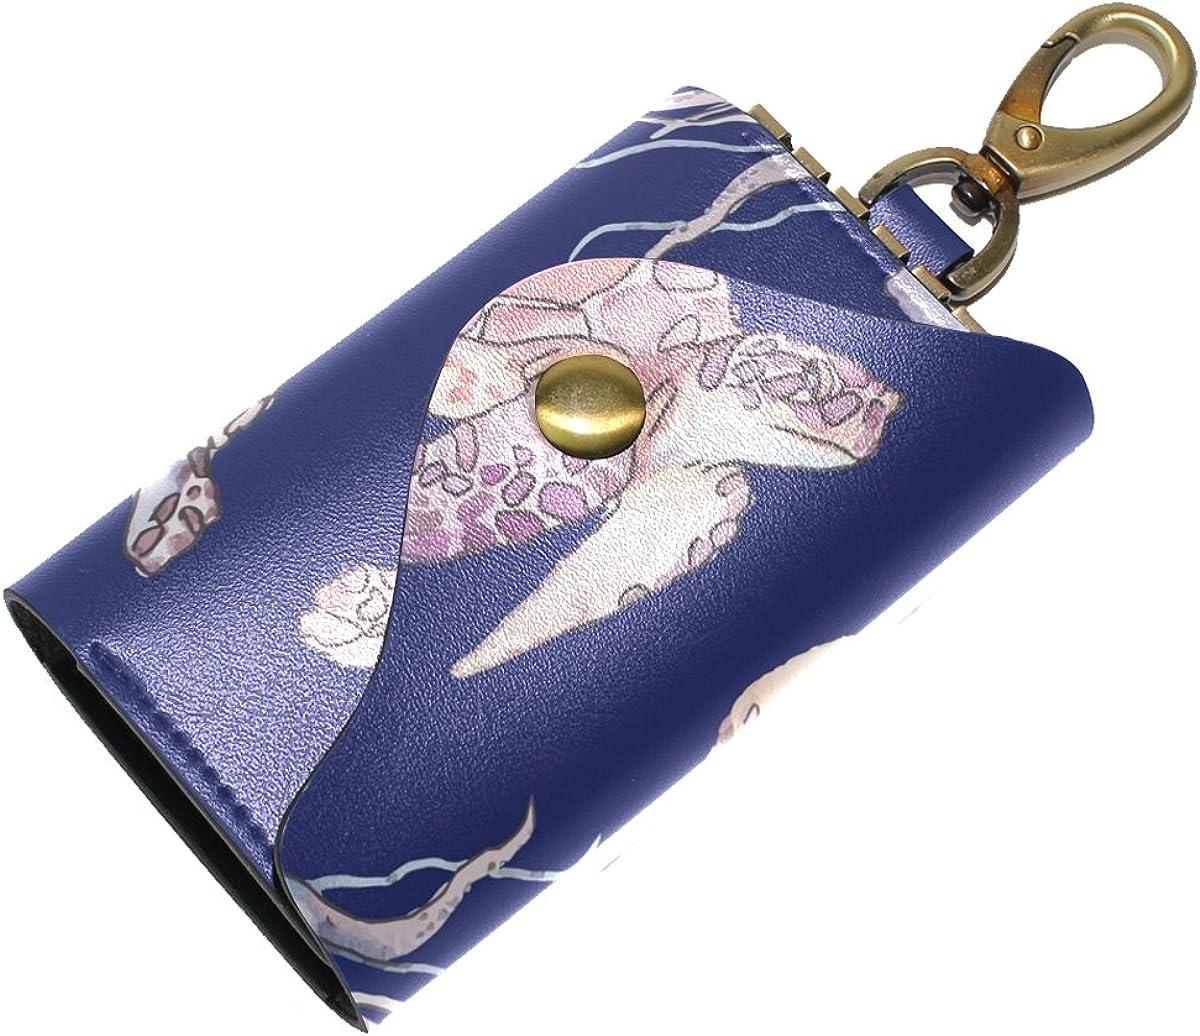 DEYYA Turtles Seamless Pattern Leather Key Case Wallets Unisex Keychain Key Holder with 6 Hooks Snap Closure